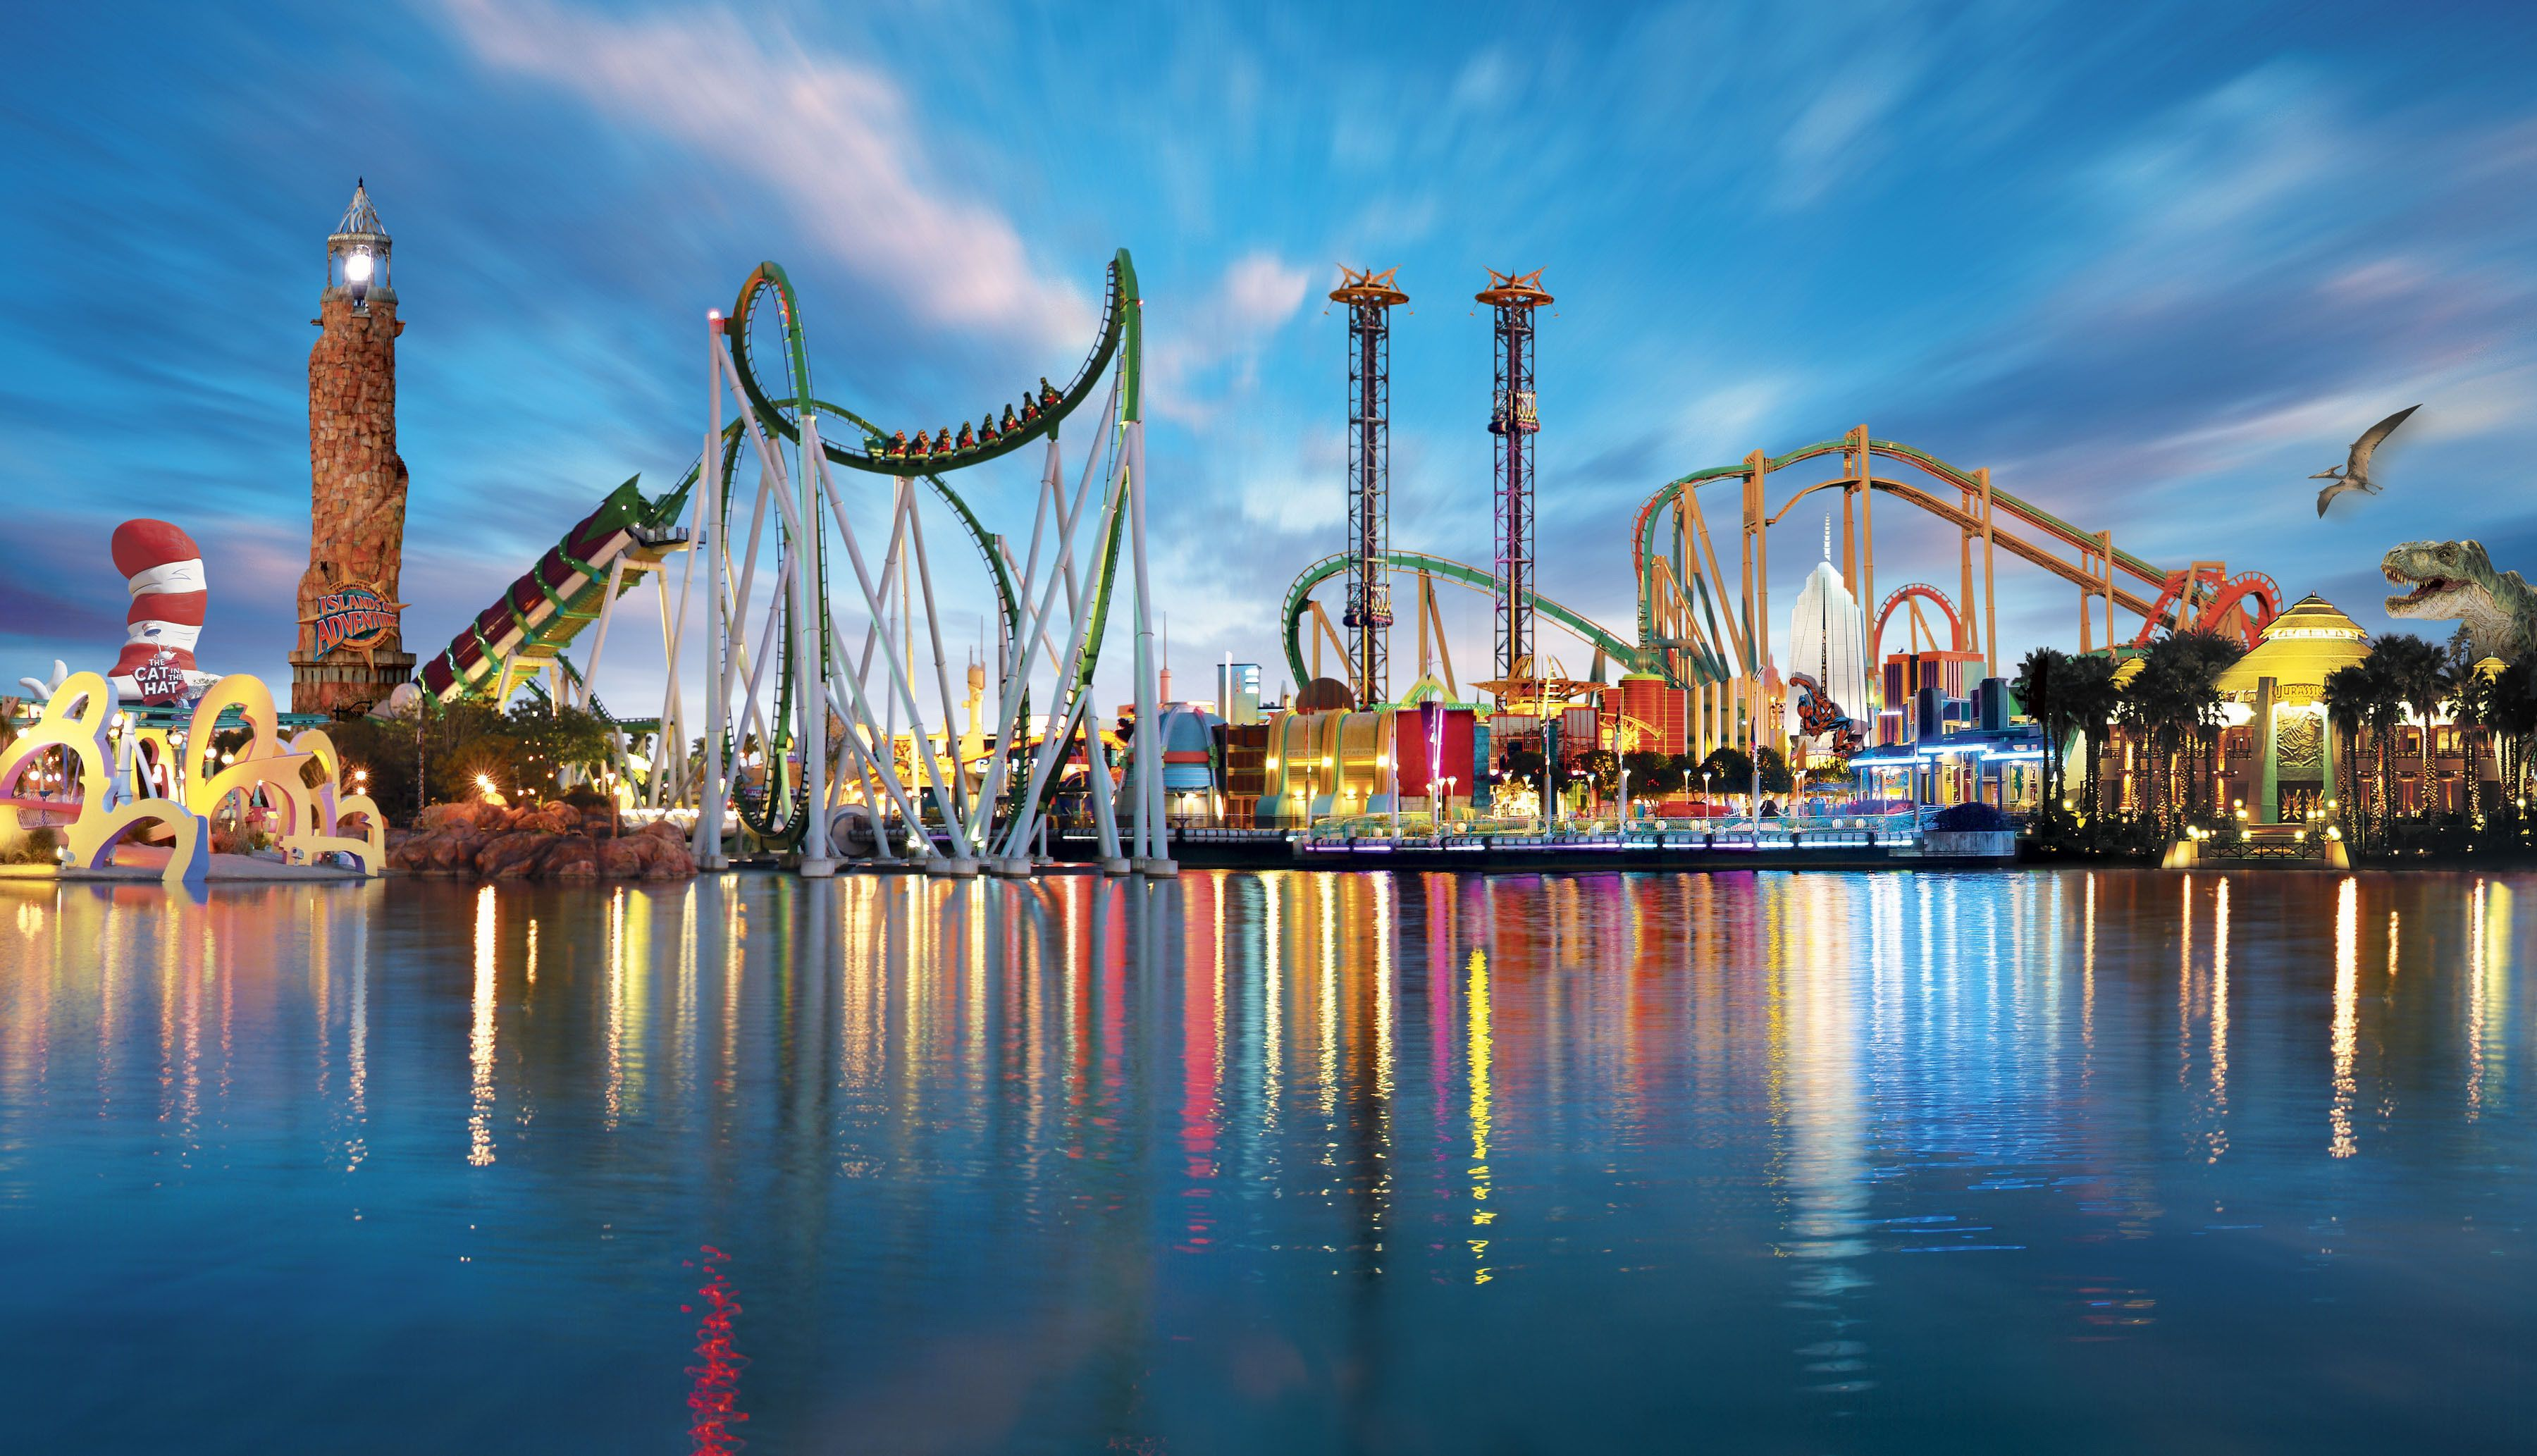 Theme Park Wallpapers   Top Theme Park Backgrounds 3600x2066